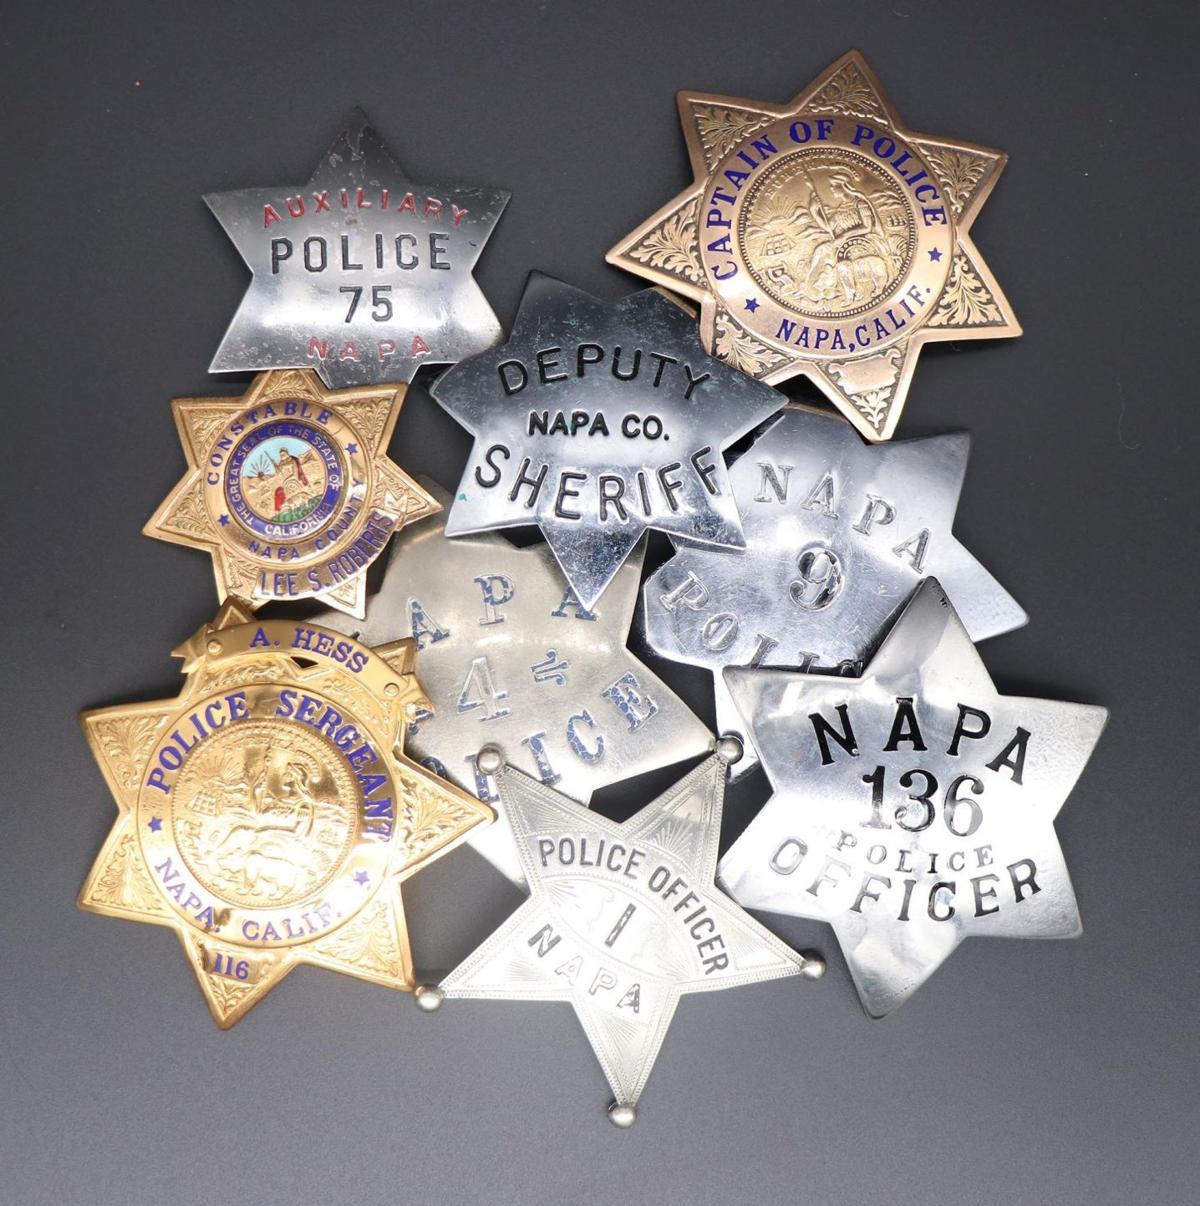 Napa Police Historical Society